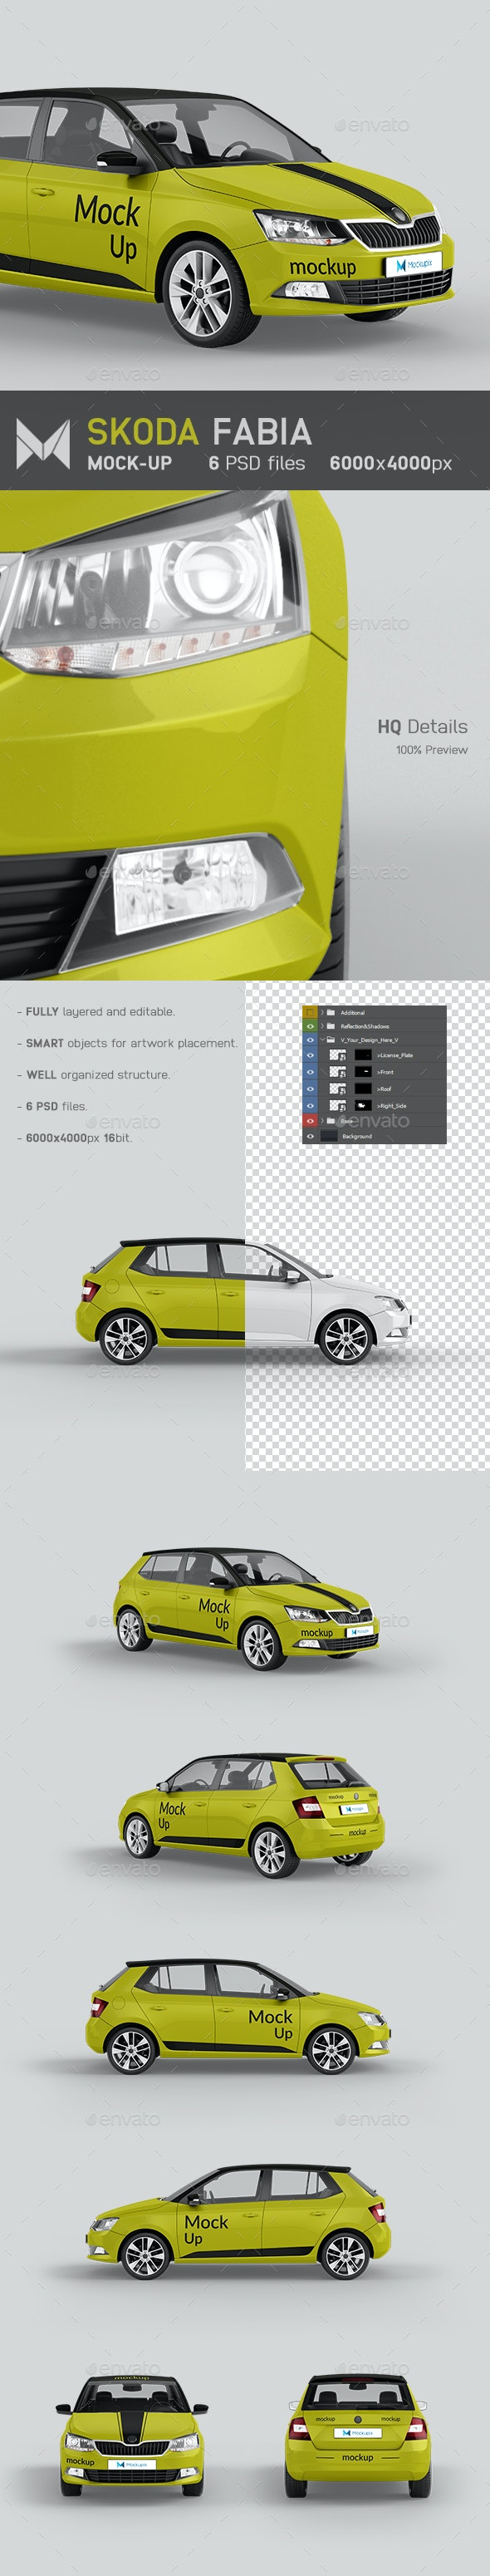 Skoda Fabia Car Mockup - Vehicle Wraps Print